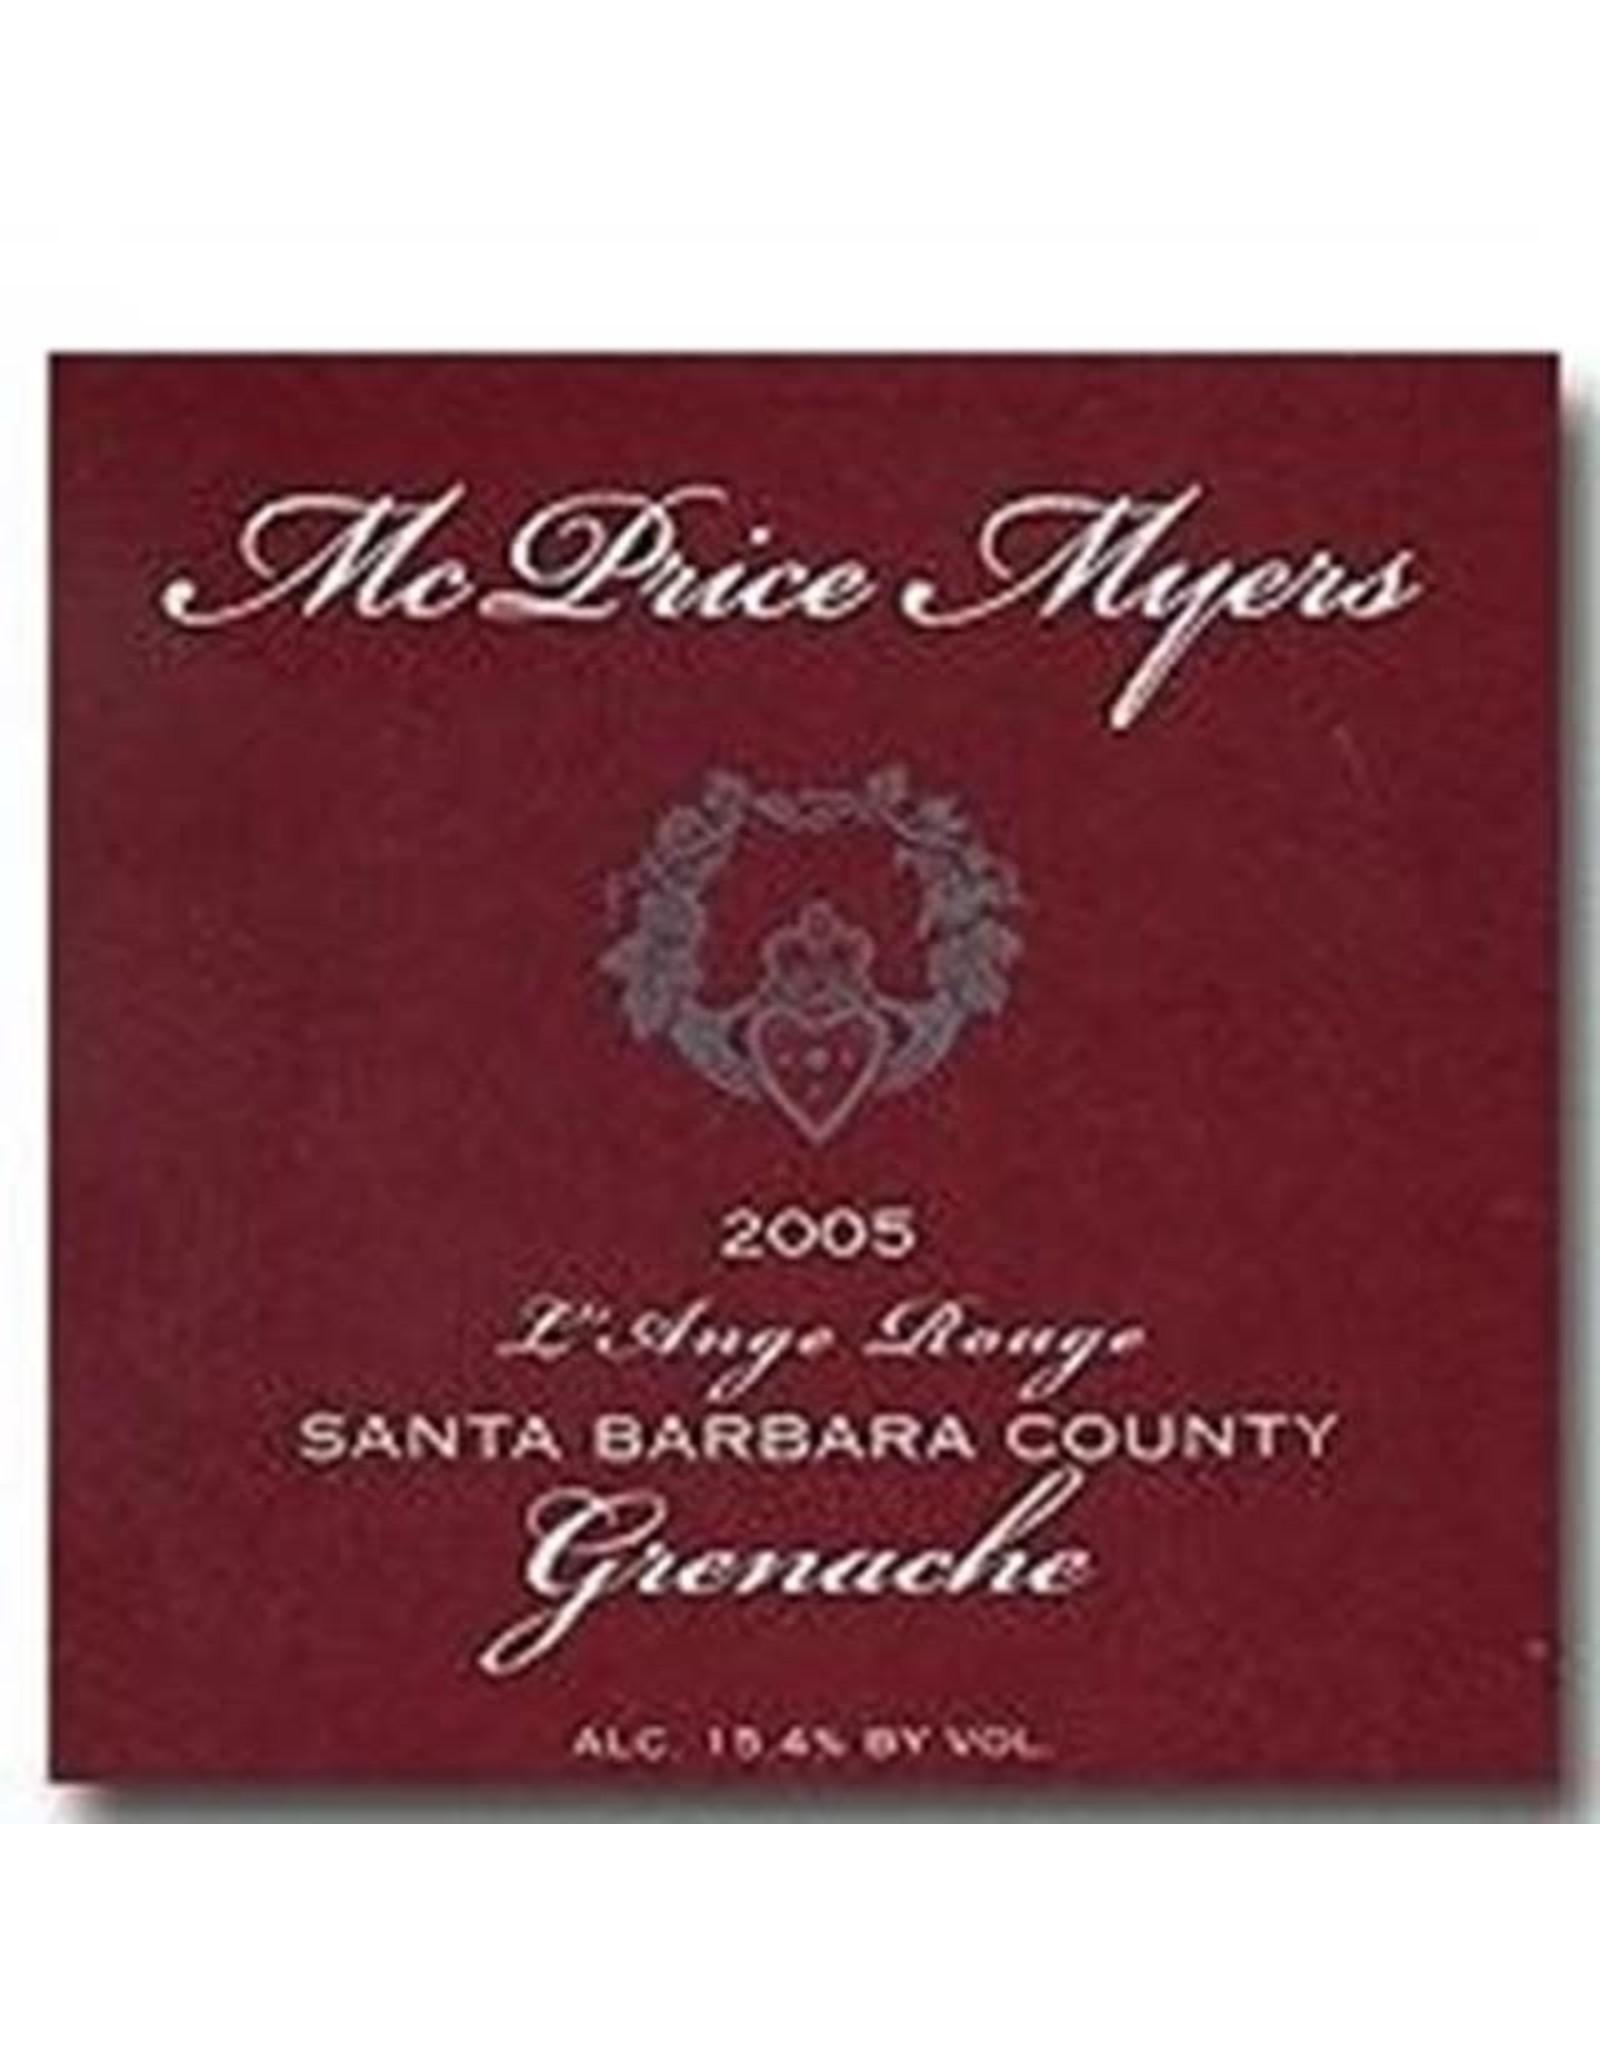 MCPRICE MYERS 2007 GRENACHE 750ML